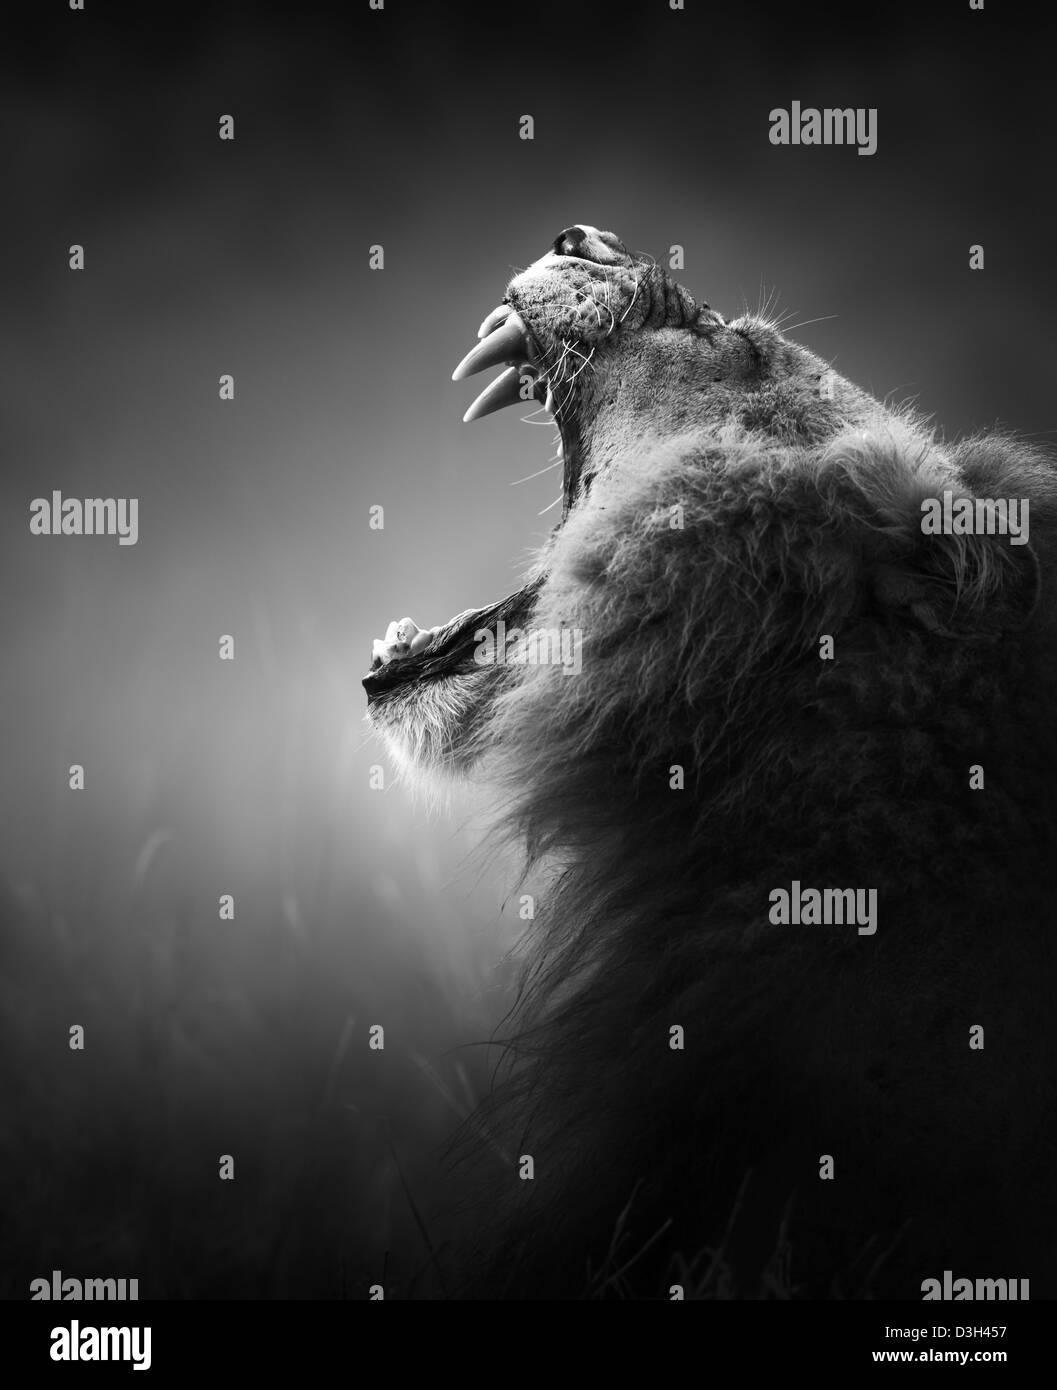 Lion Porträt - Krüger Nationalpark - Südafrika (künstlerische Verarbeitung) Stockbild